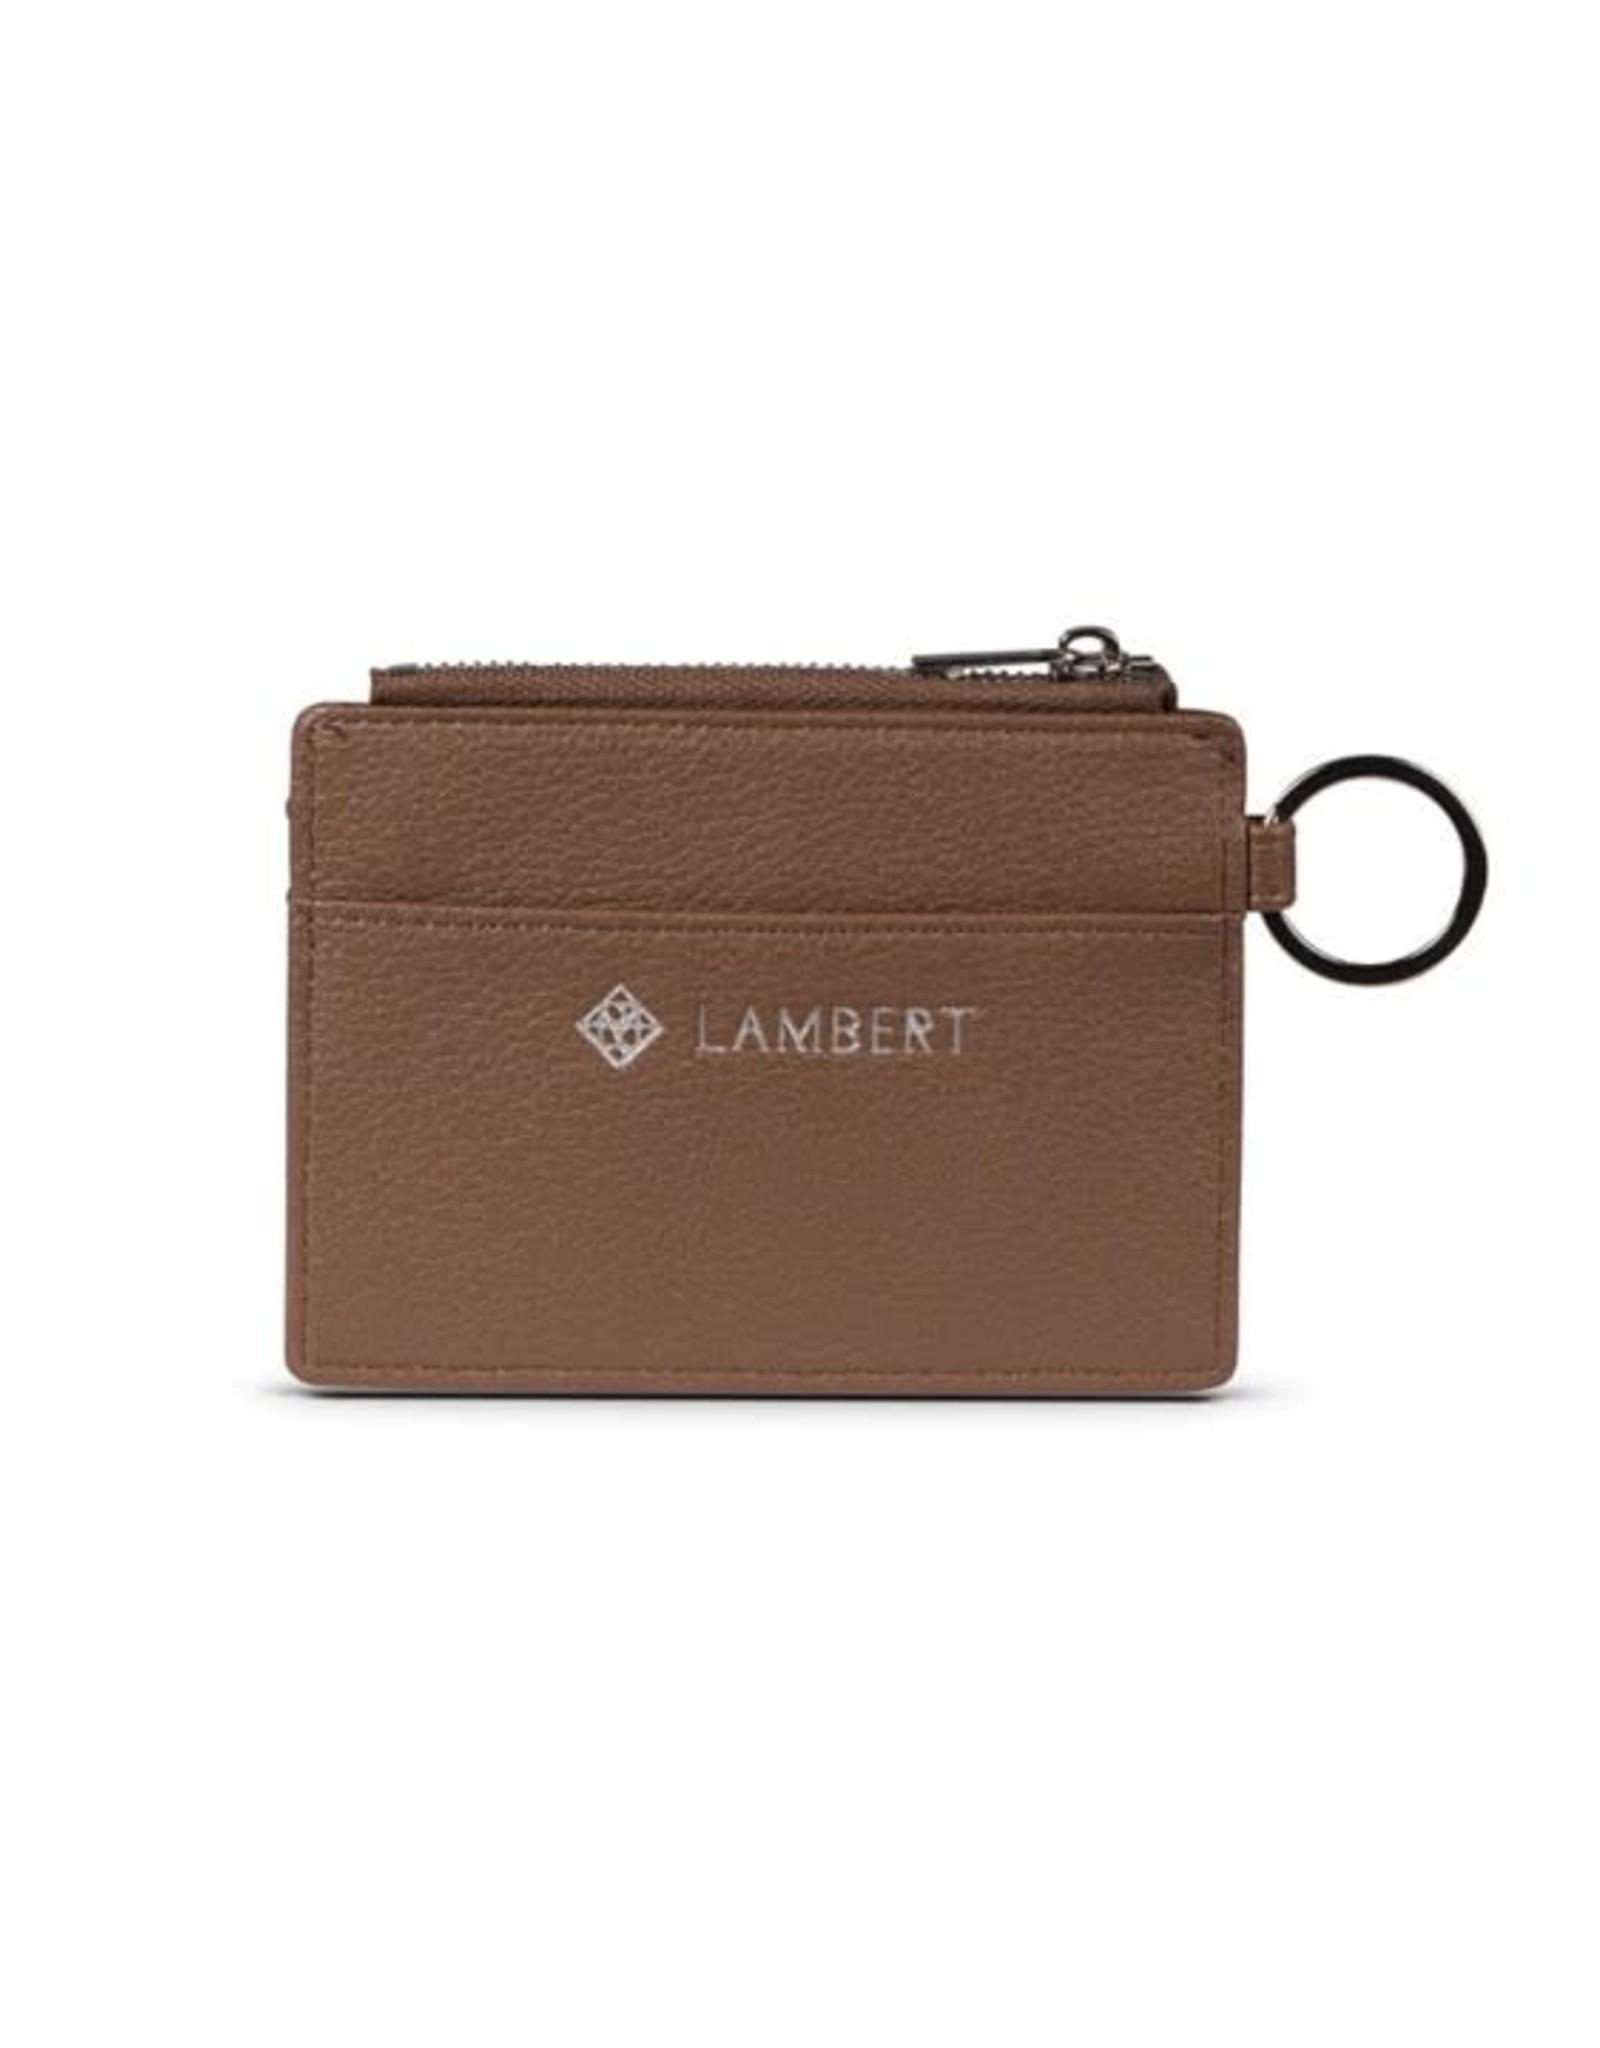 Lambert Porte-cartes  Laura - Wood